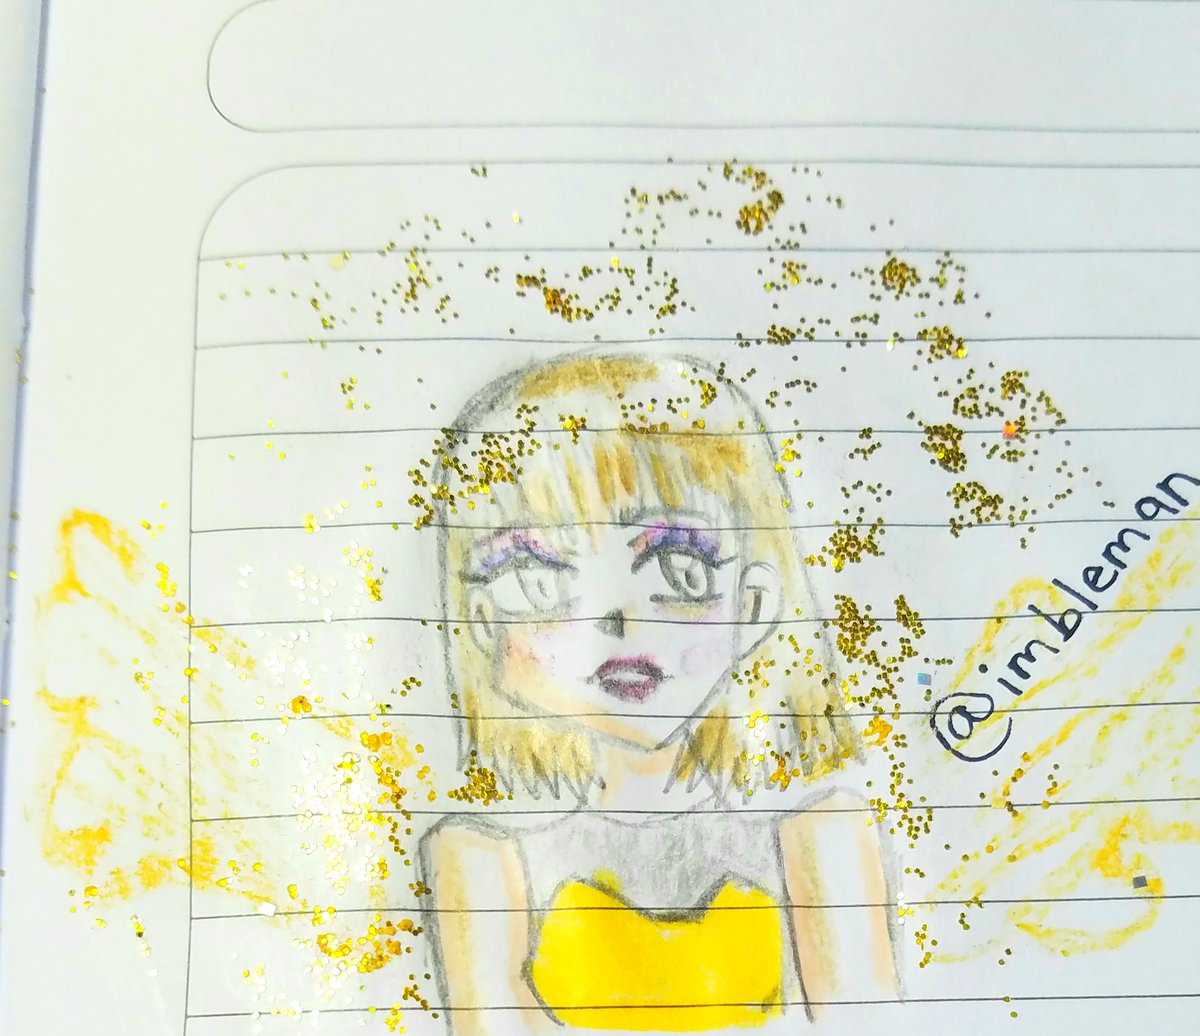 si te ofende mi brillo , hazte a un lado voy a pasar✨😈 * #drawing #draw #imbleman #thebleman #ArtistOnTwitter